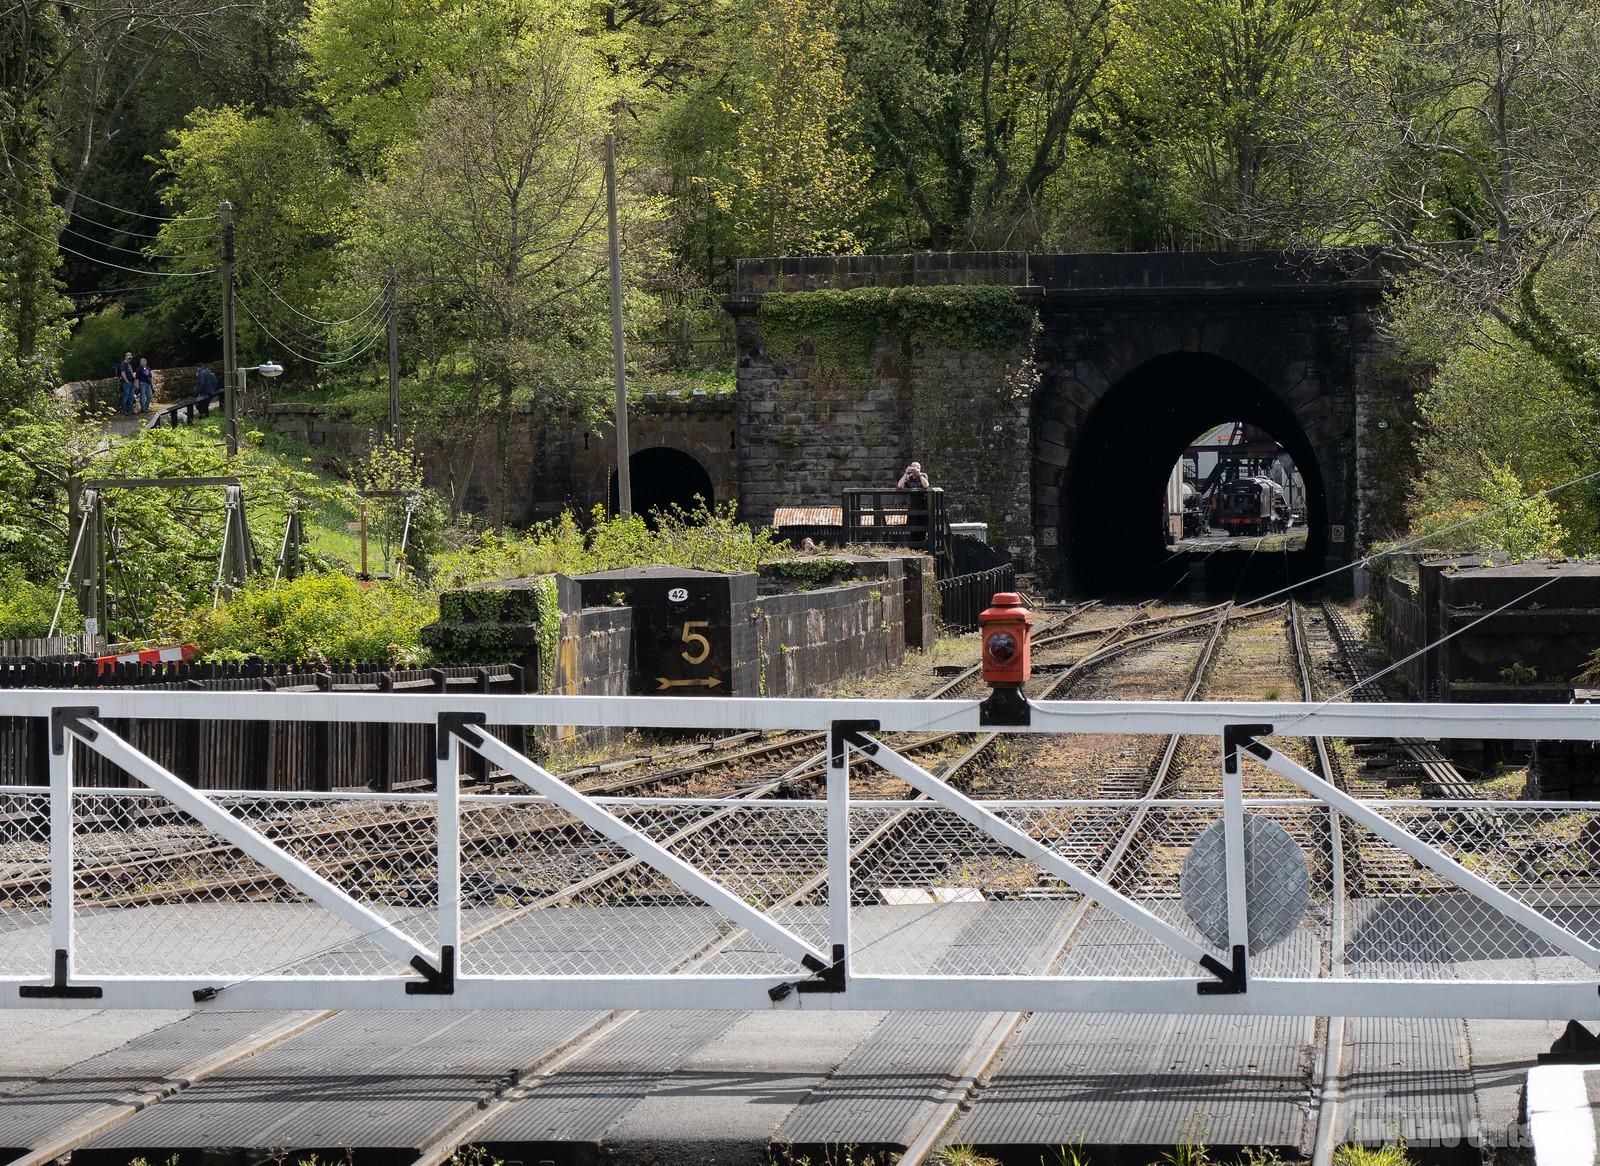 P5172253 - North York Moors Railway